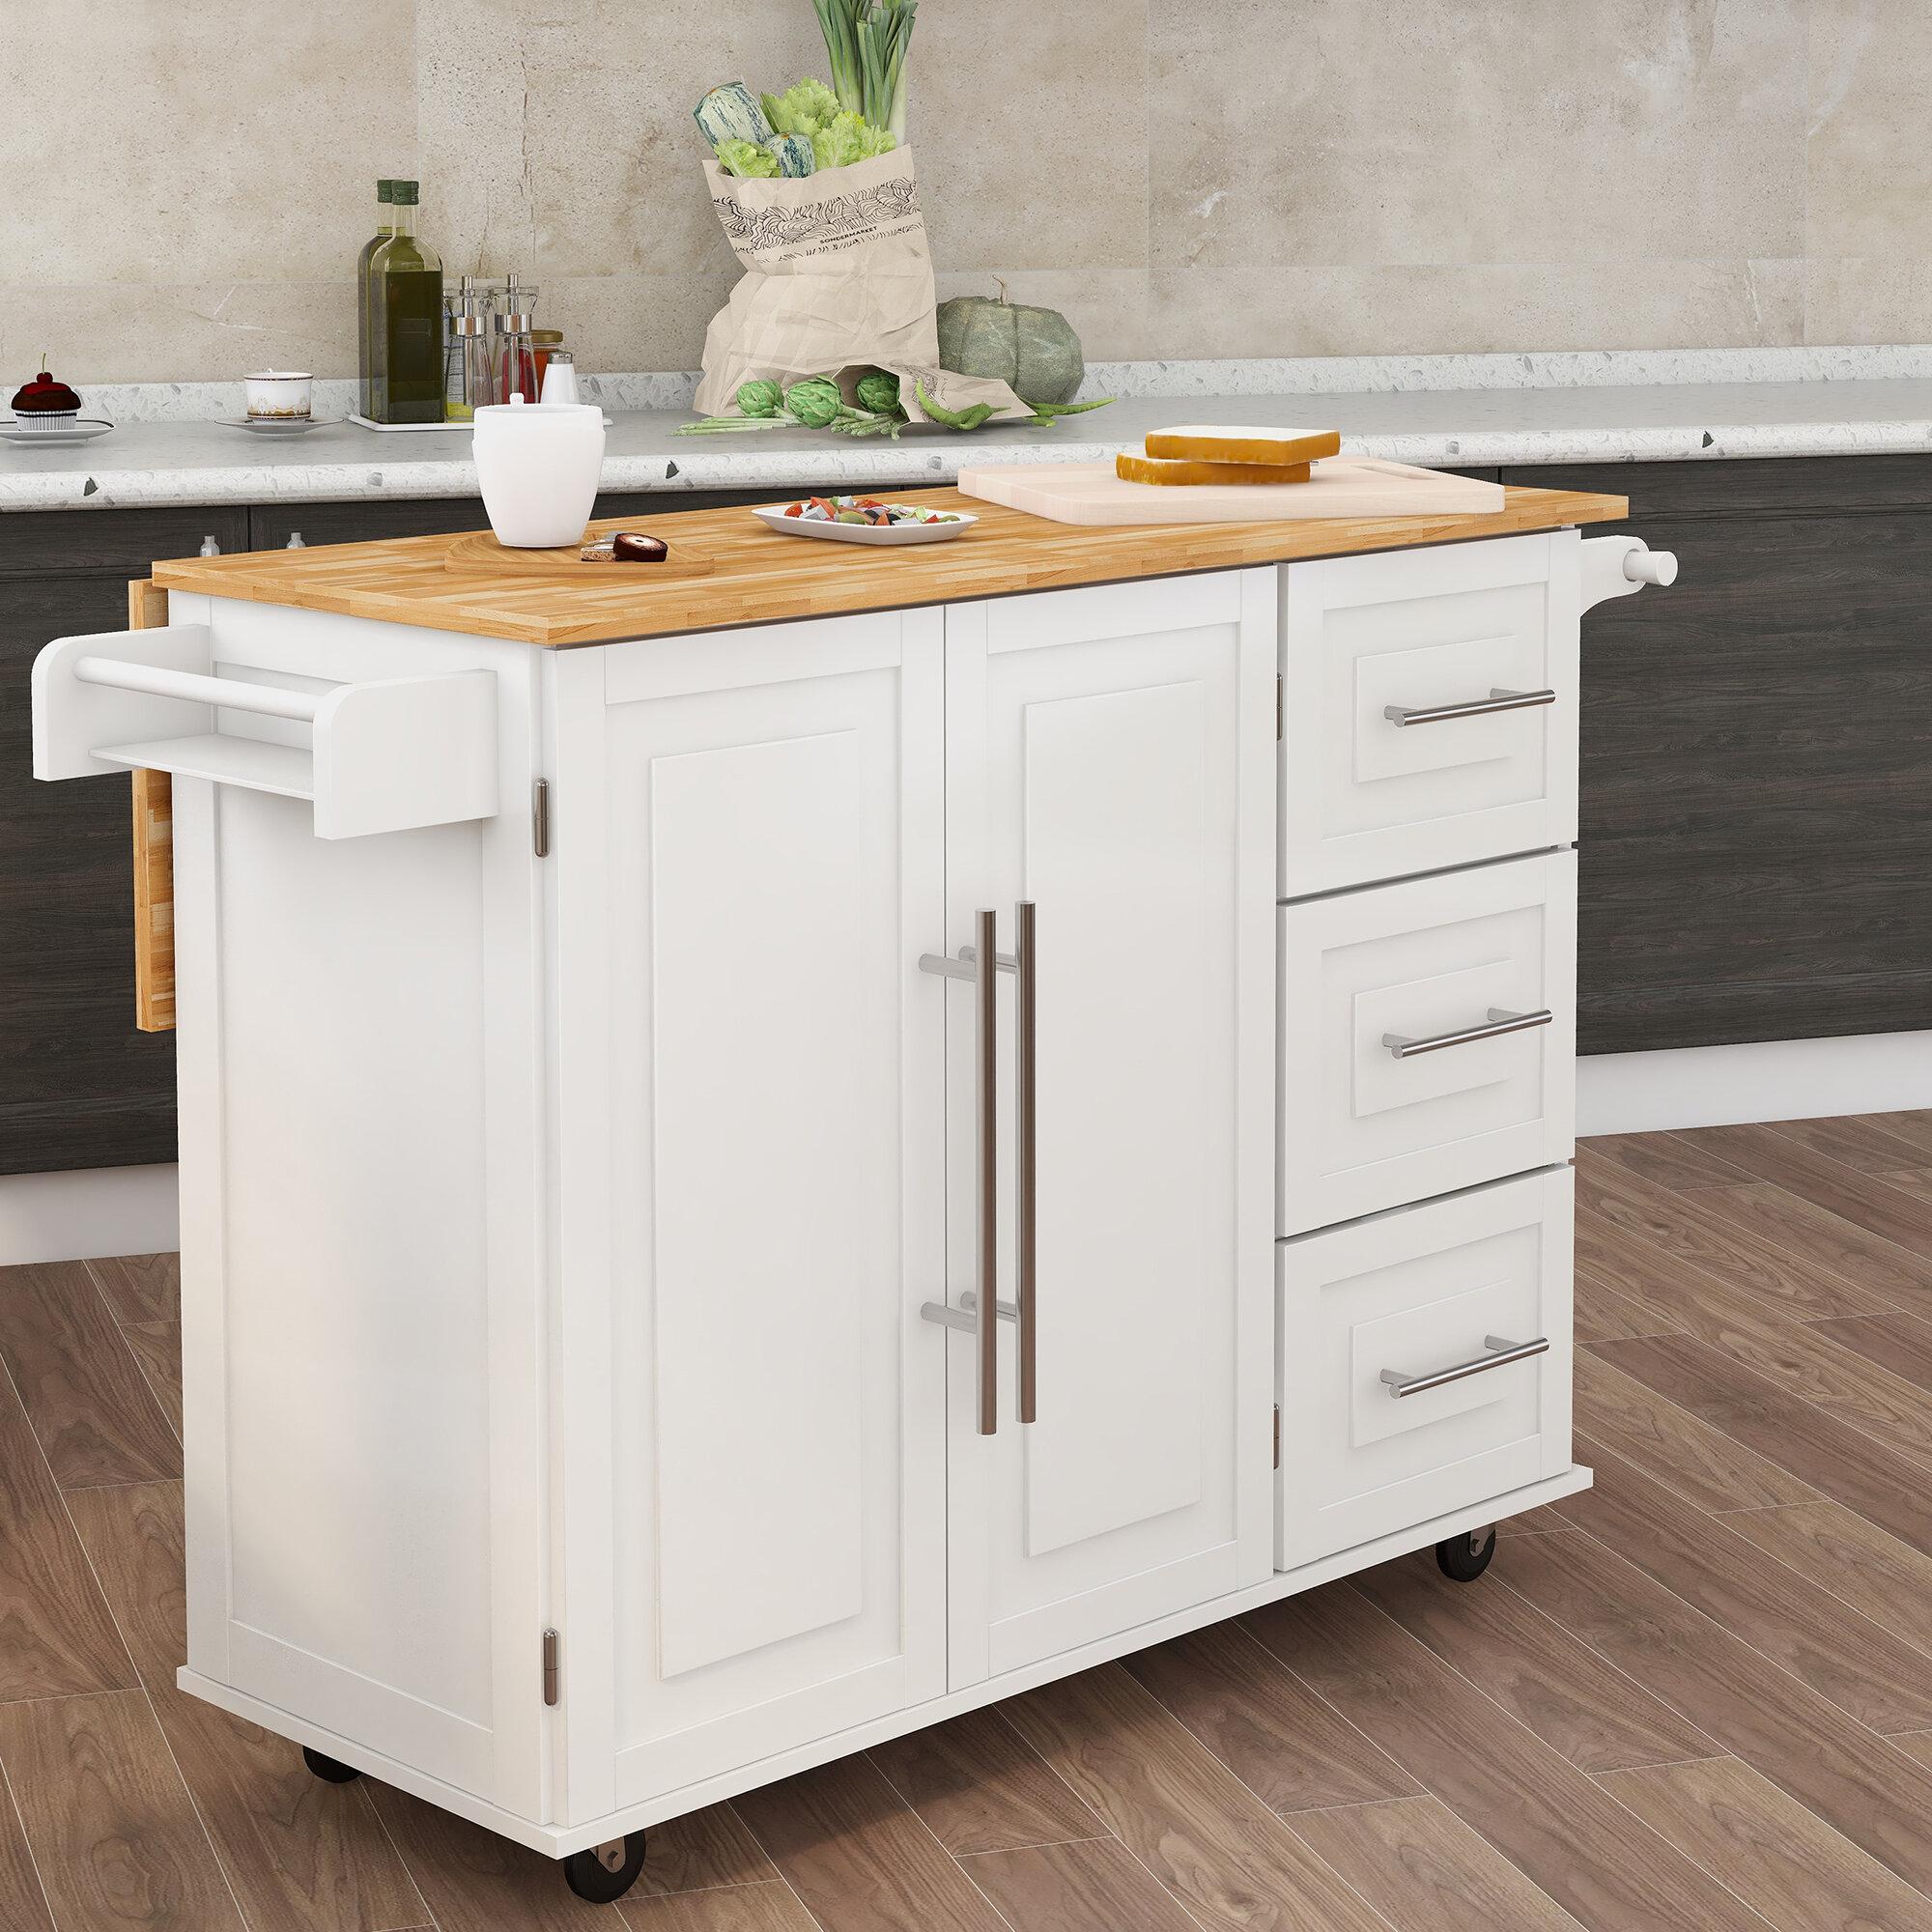 Red Barrel Studio Aybaniz Kitchen Island Solid Wood With Spice Rack Towel Rack And Extensible Table Top Reviews Wayfair